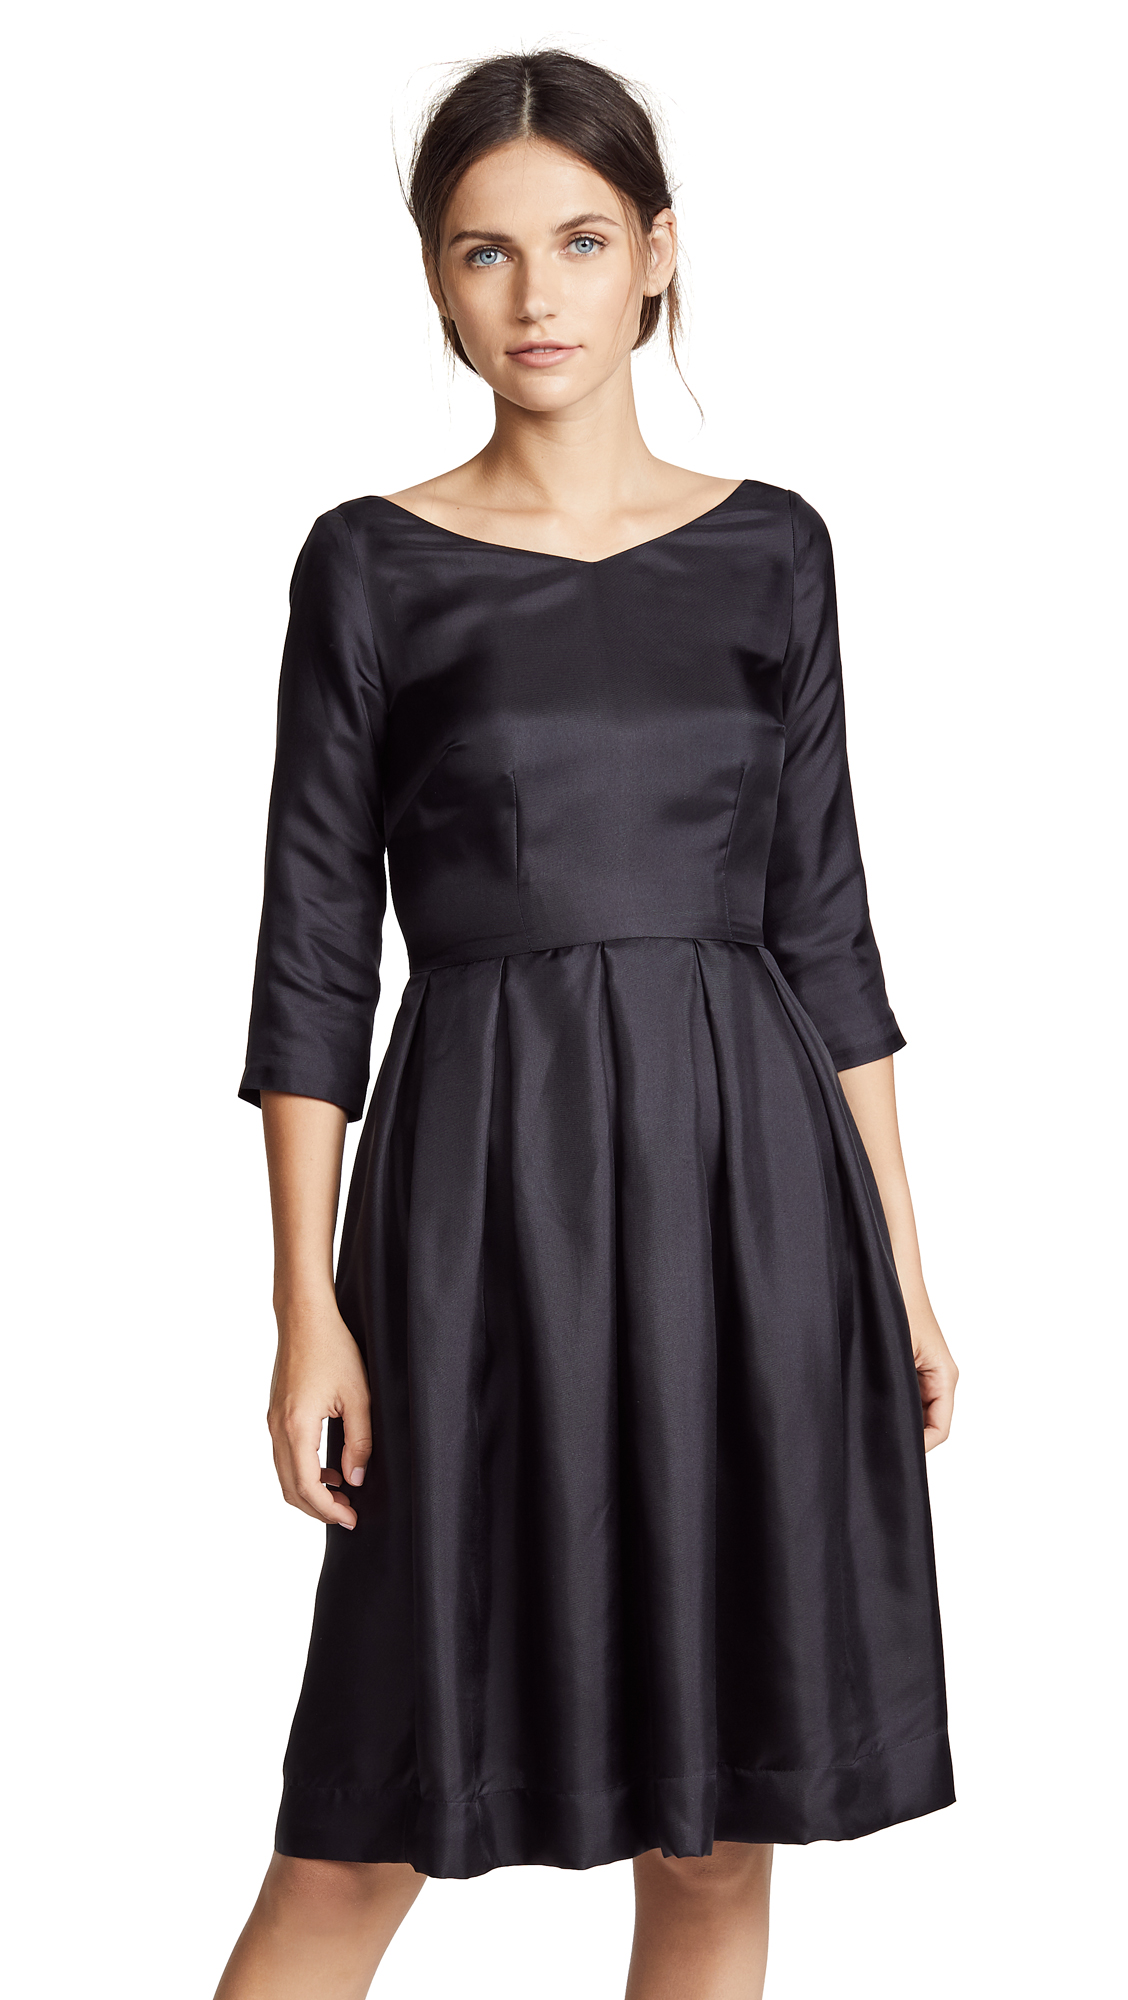 La Prestic Ouiston Bourgeouise 3/4 Sleeve Dress In Black